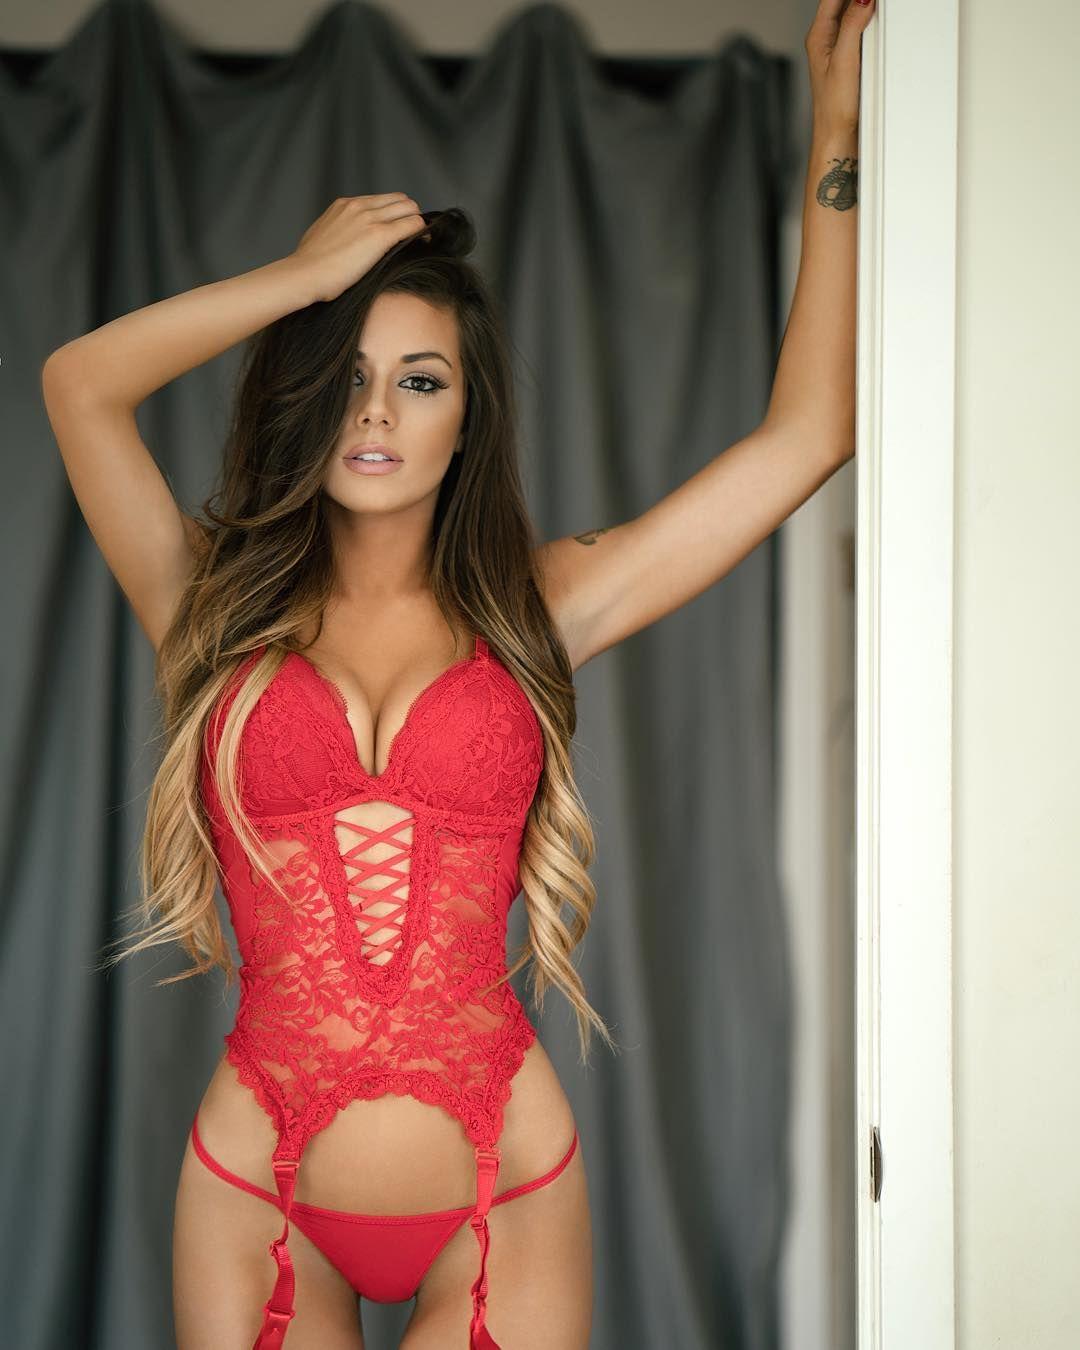 Juli Annee | sexy stuff for me | Pinterest | Brunettes, Female ...